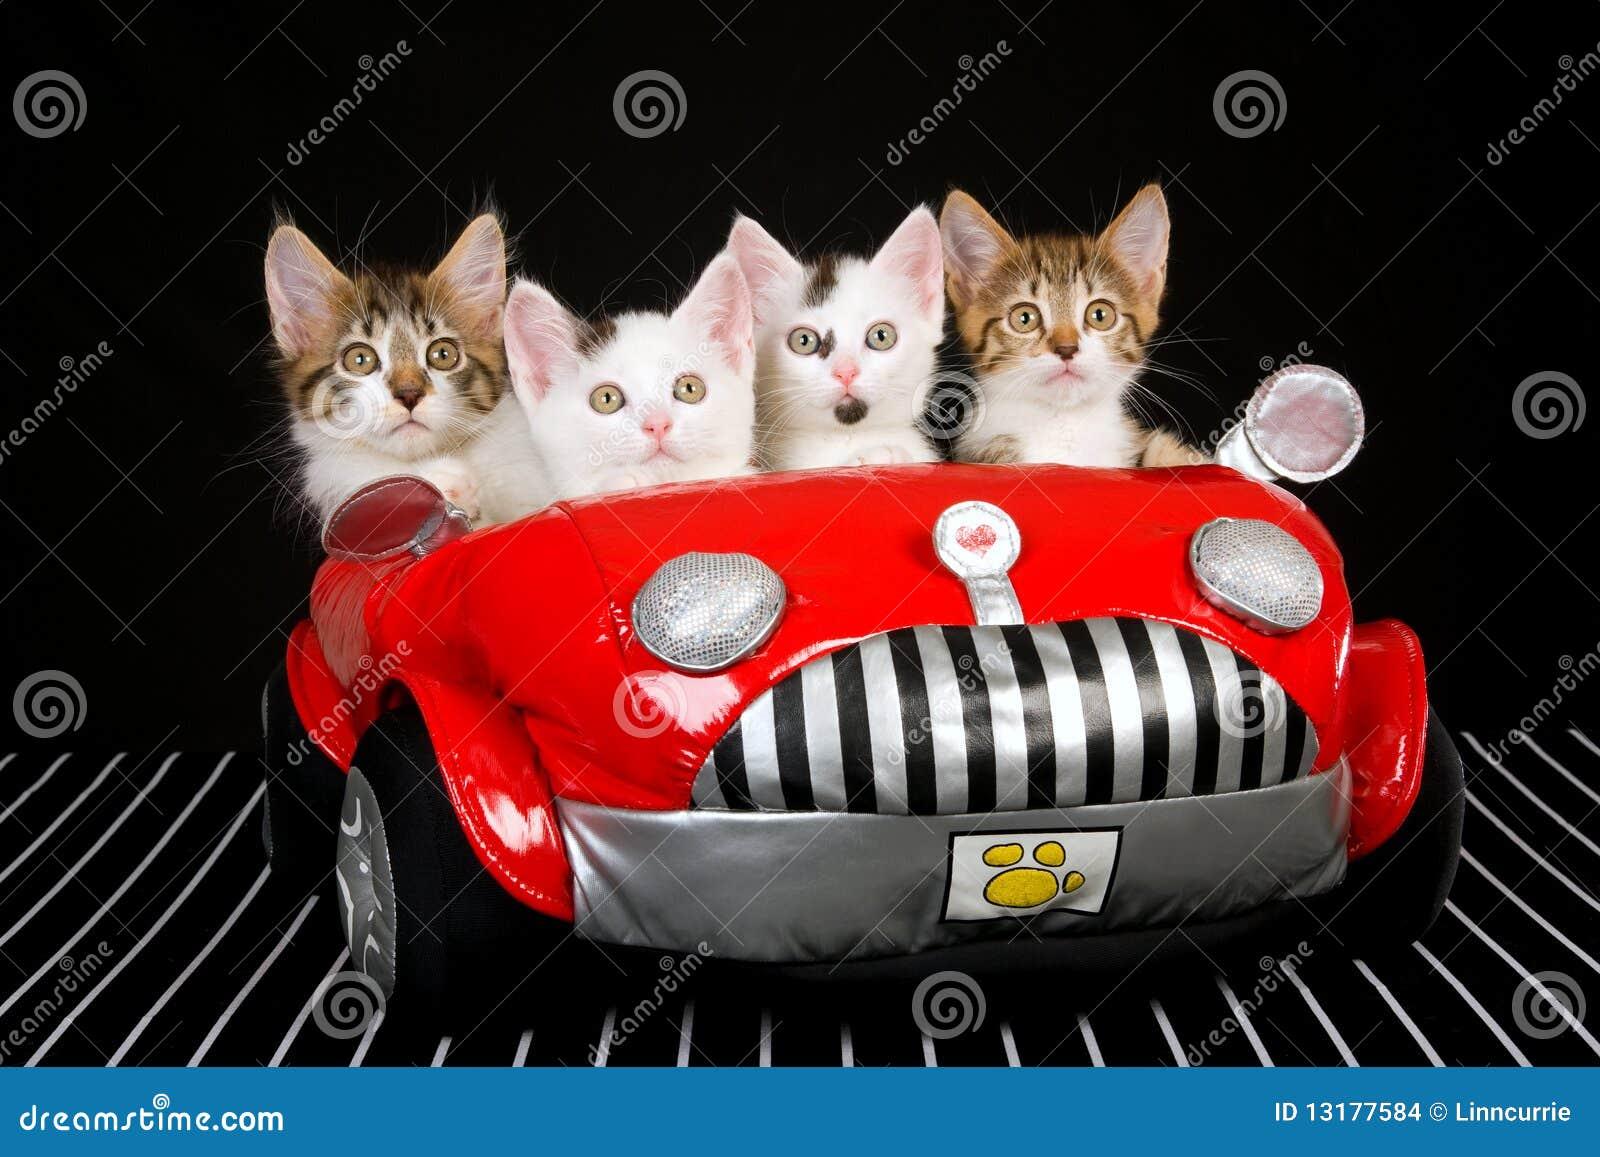 Cat Driving A Car Music Video